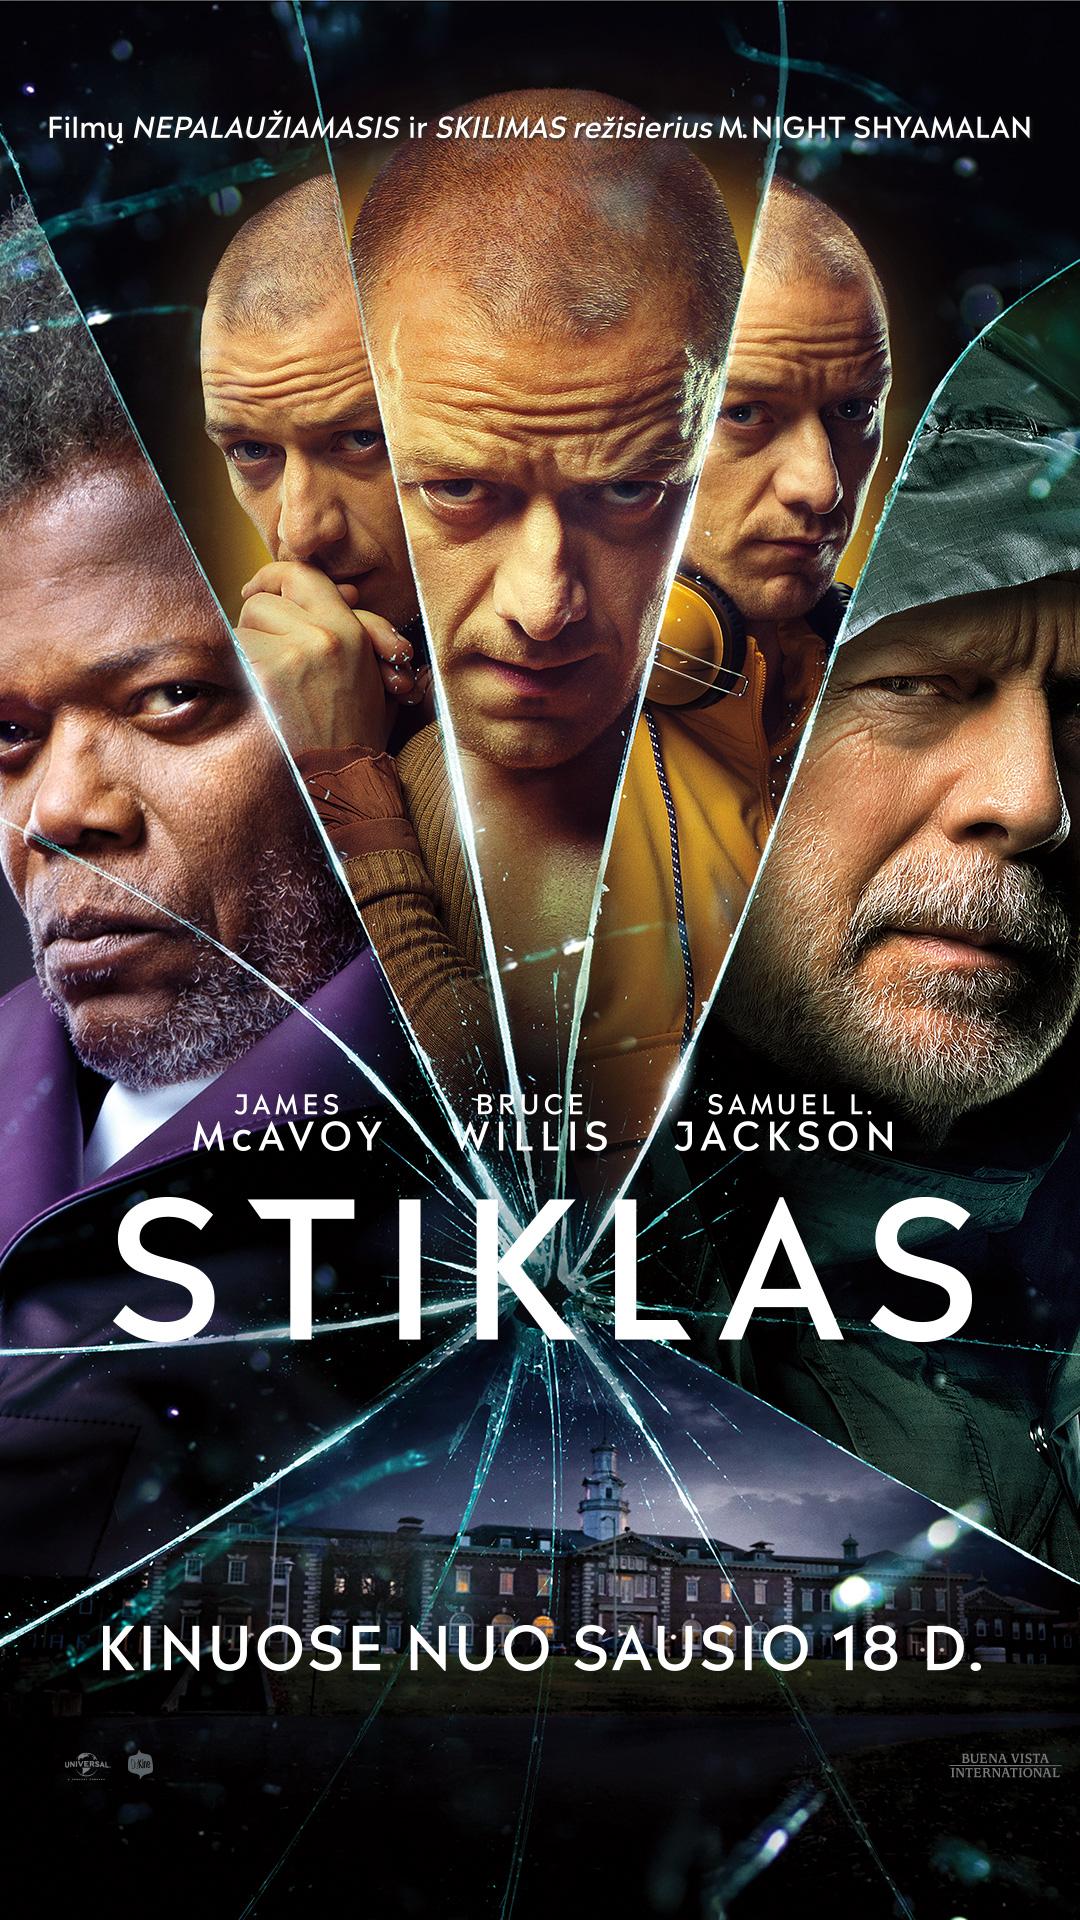 Stiklas (Glass)